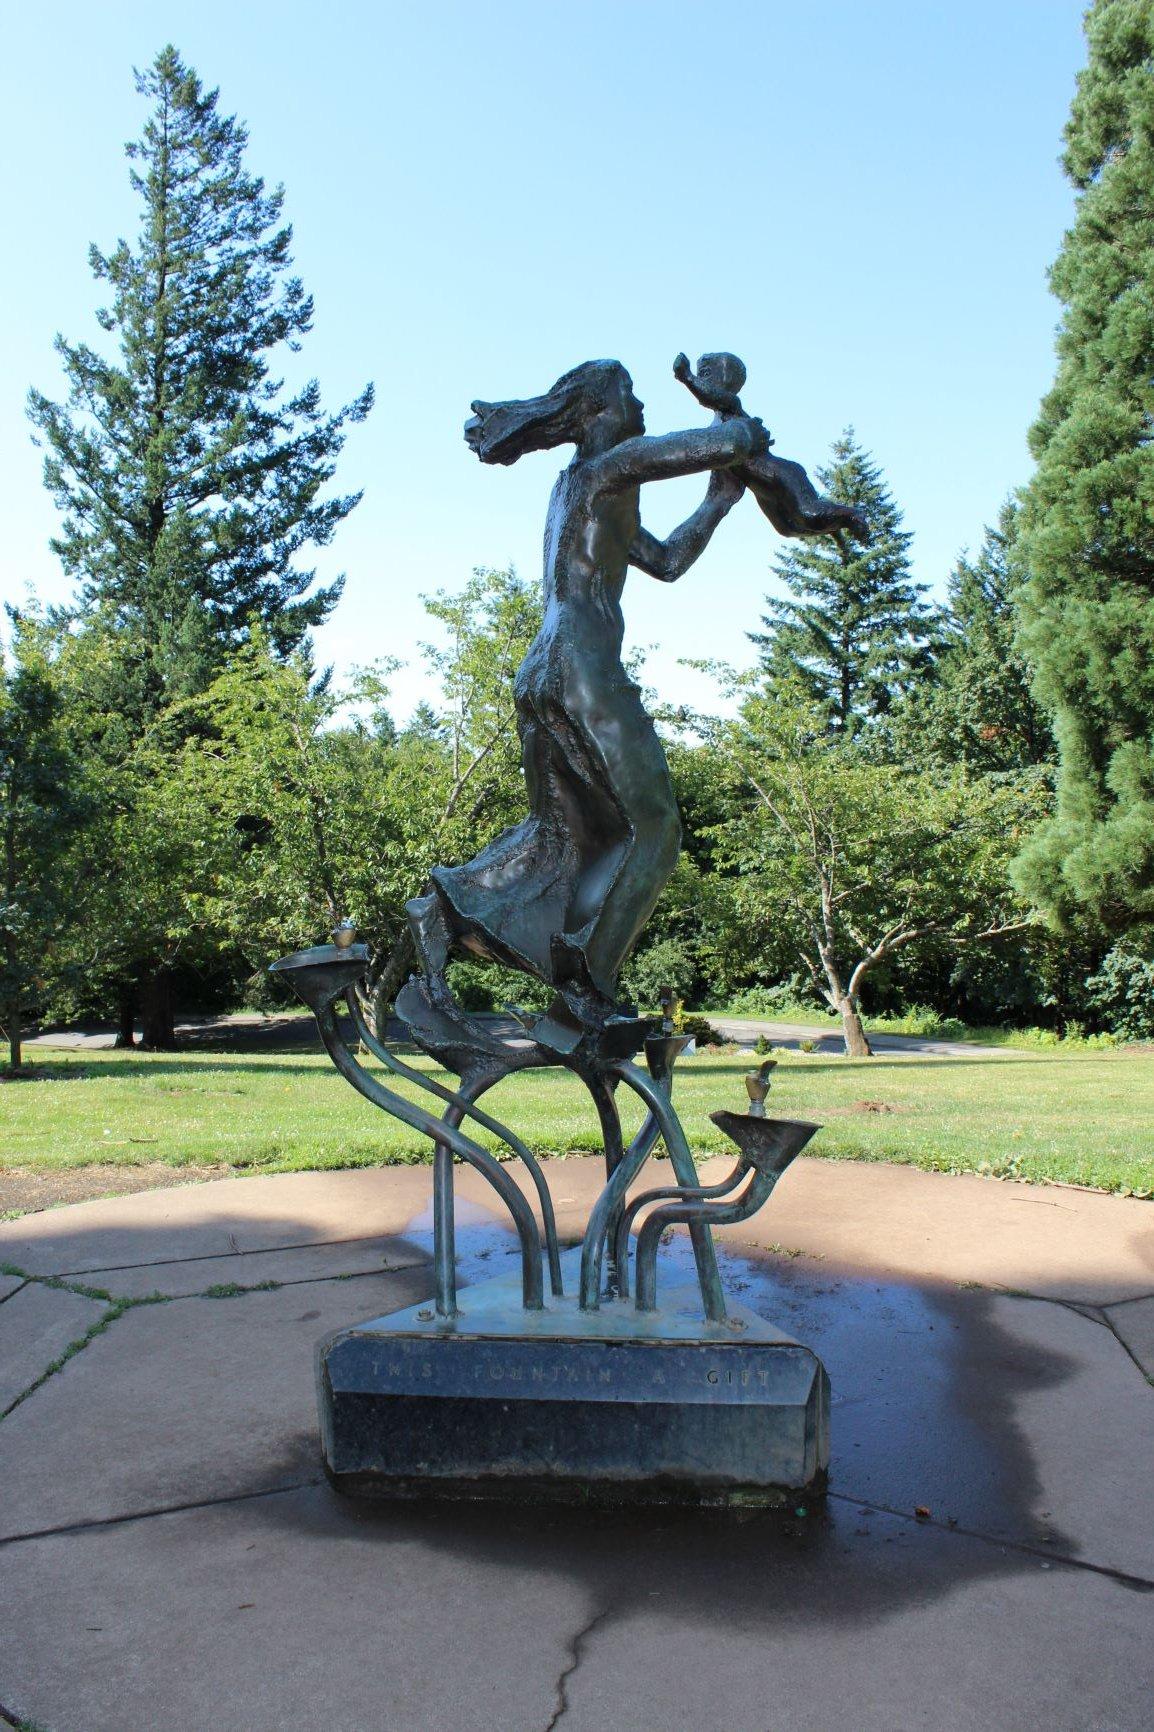 Joy (Pioneer Woman). Photo by Cynthia Prescott.